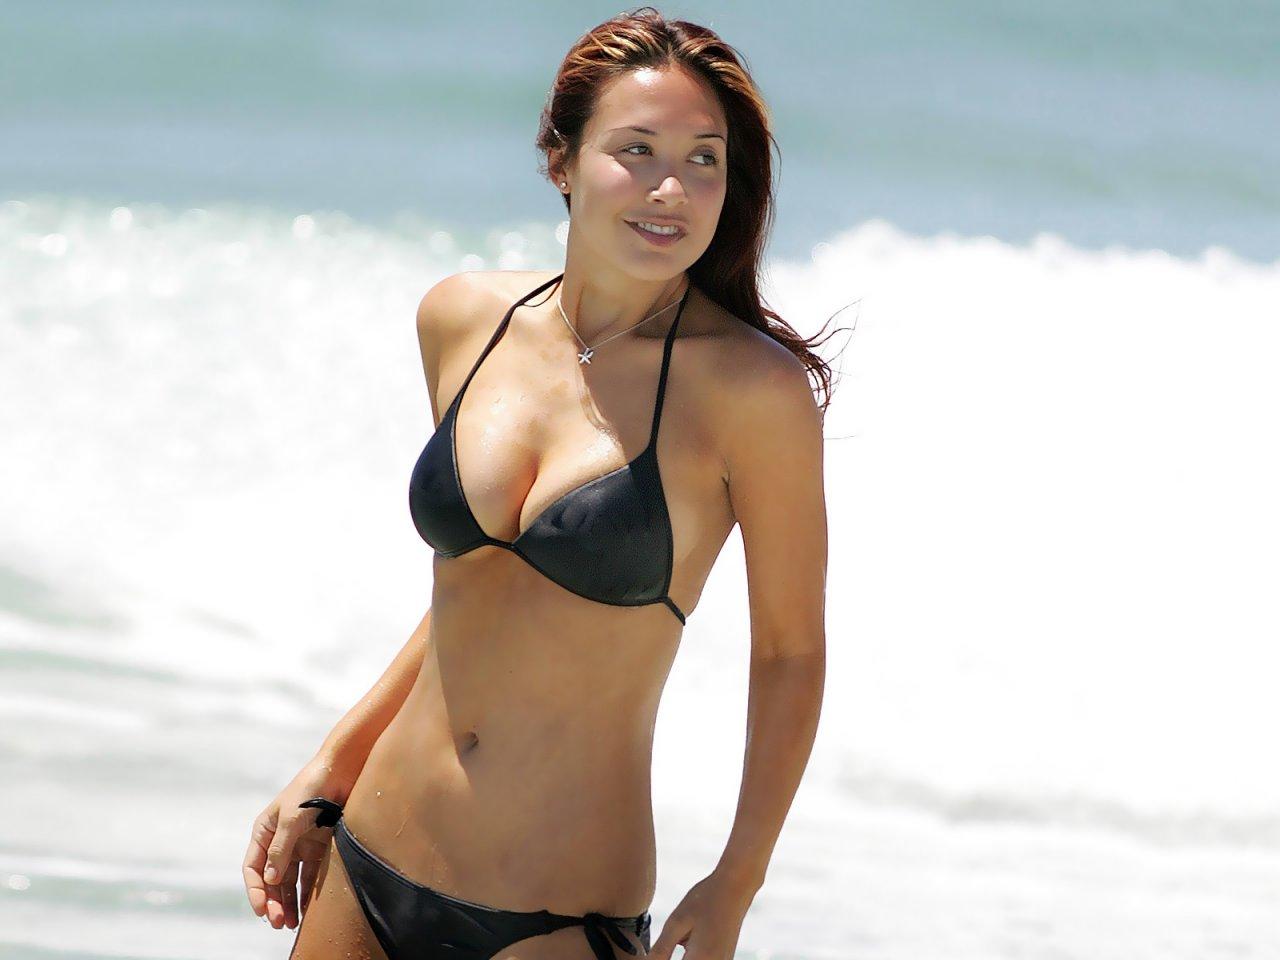 myleene klass bikini pictures